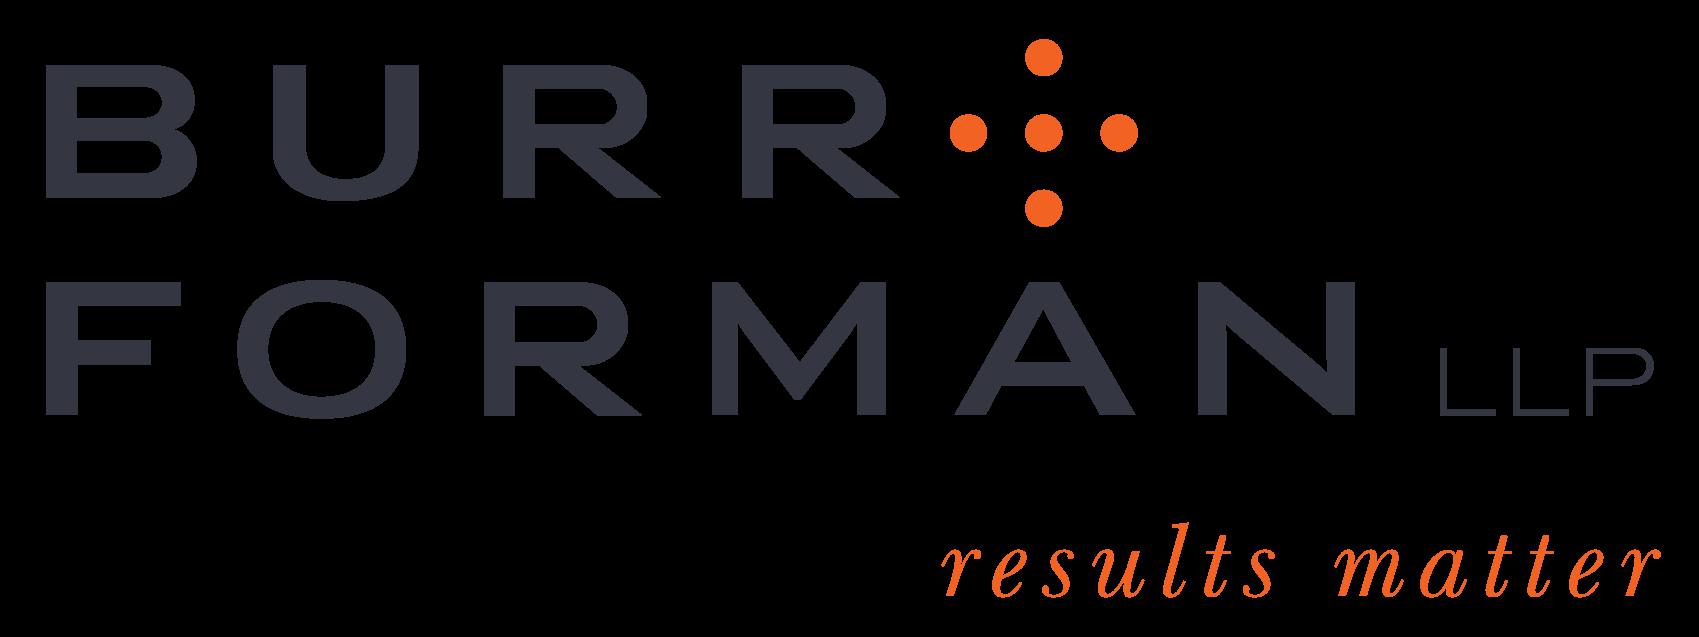 Bronze - Burr & Forman LLP - Logo